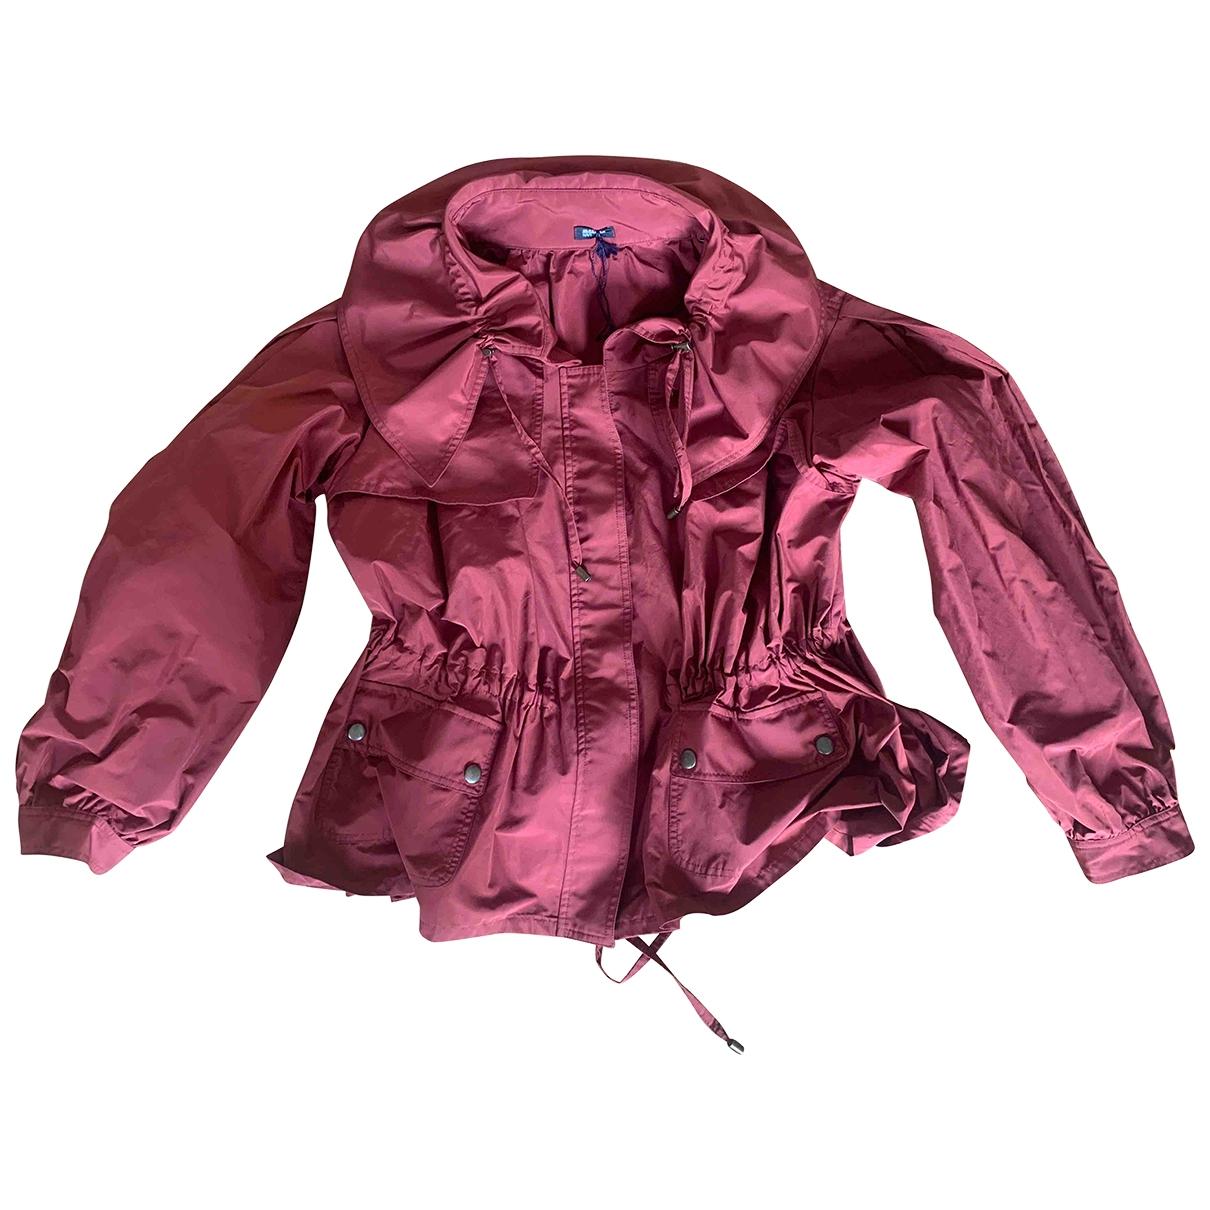 Jil Sander \N Jacke in  Rot Polyester